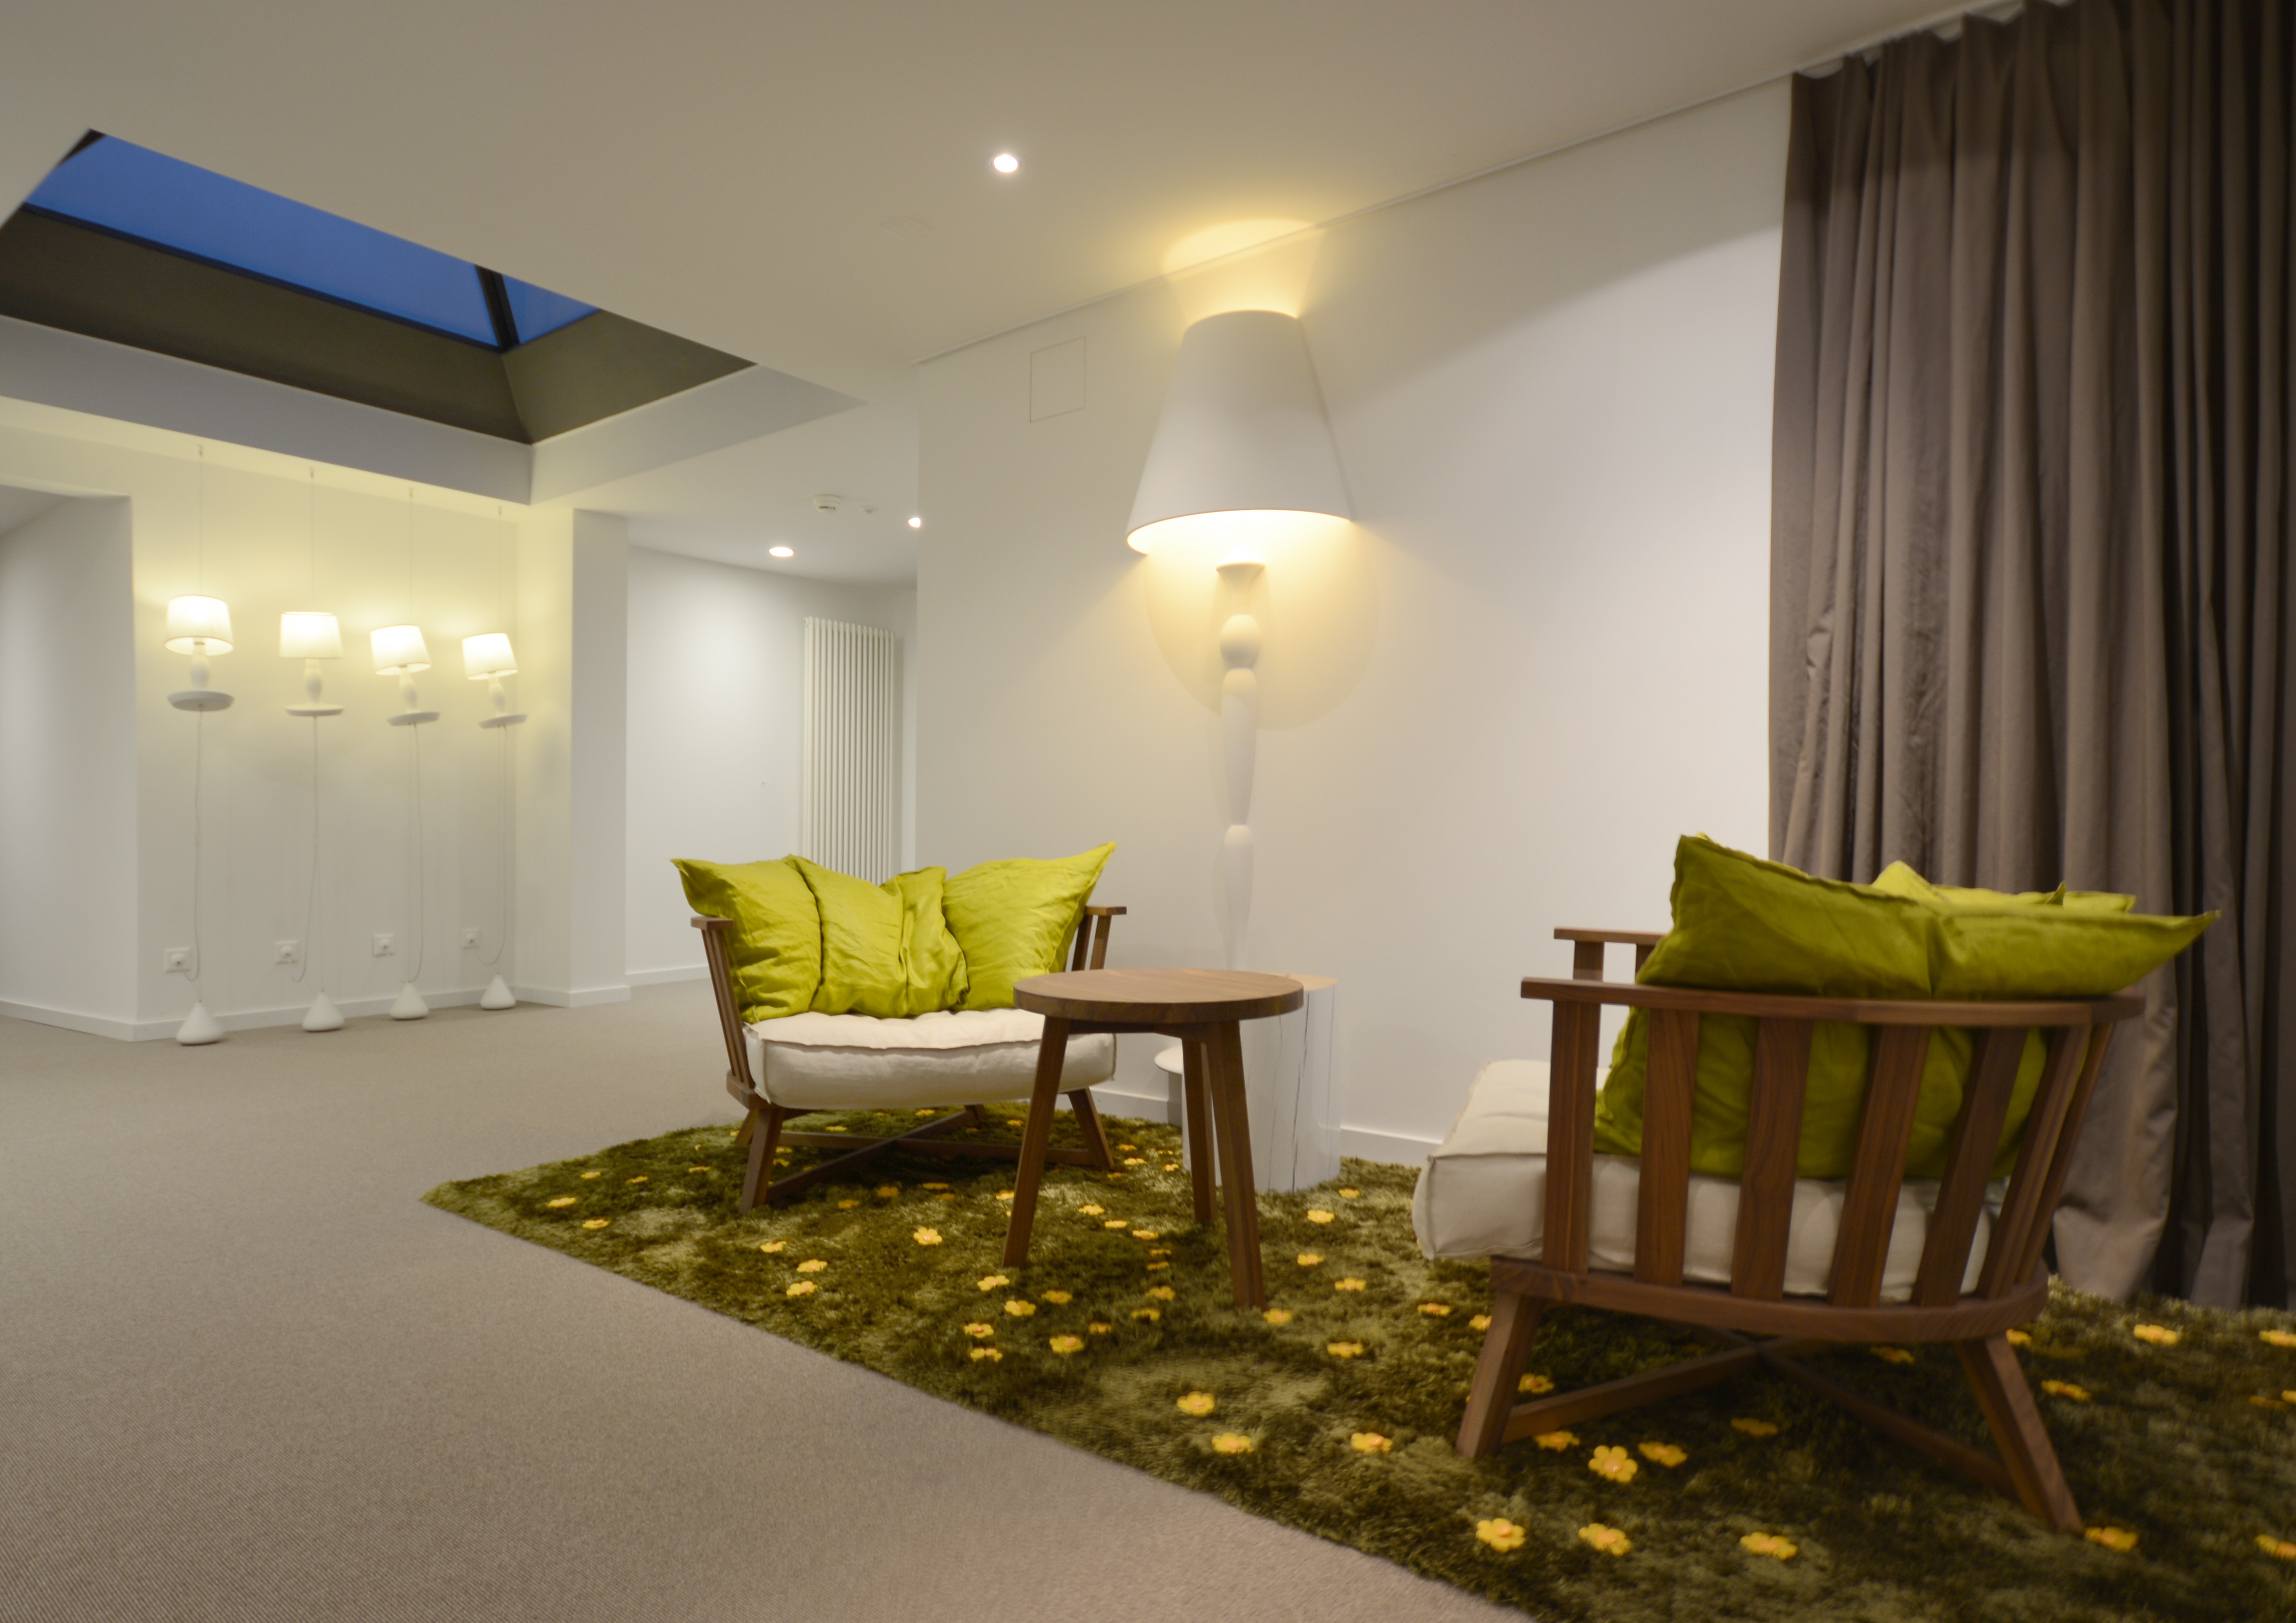 Landhotel linde fislisbach innenarchitektur leitgedanke for Designer innenarchitektur